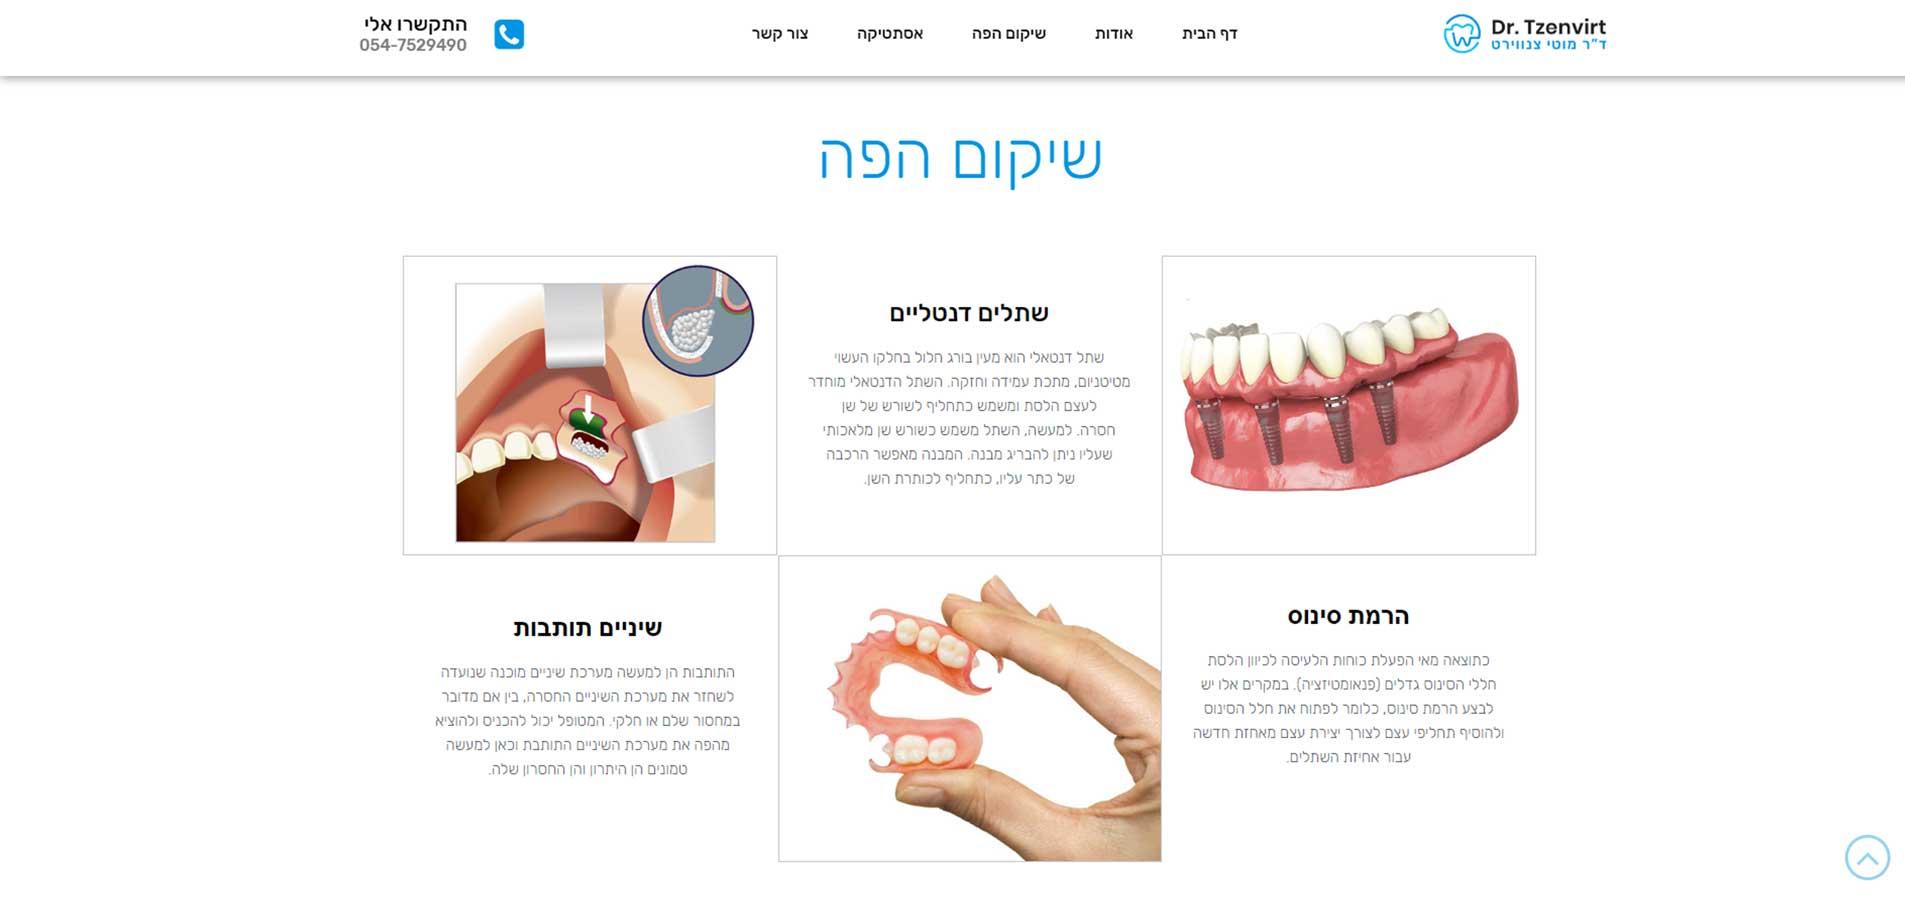 details about DR. MOTI TZENVIRT specialities